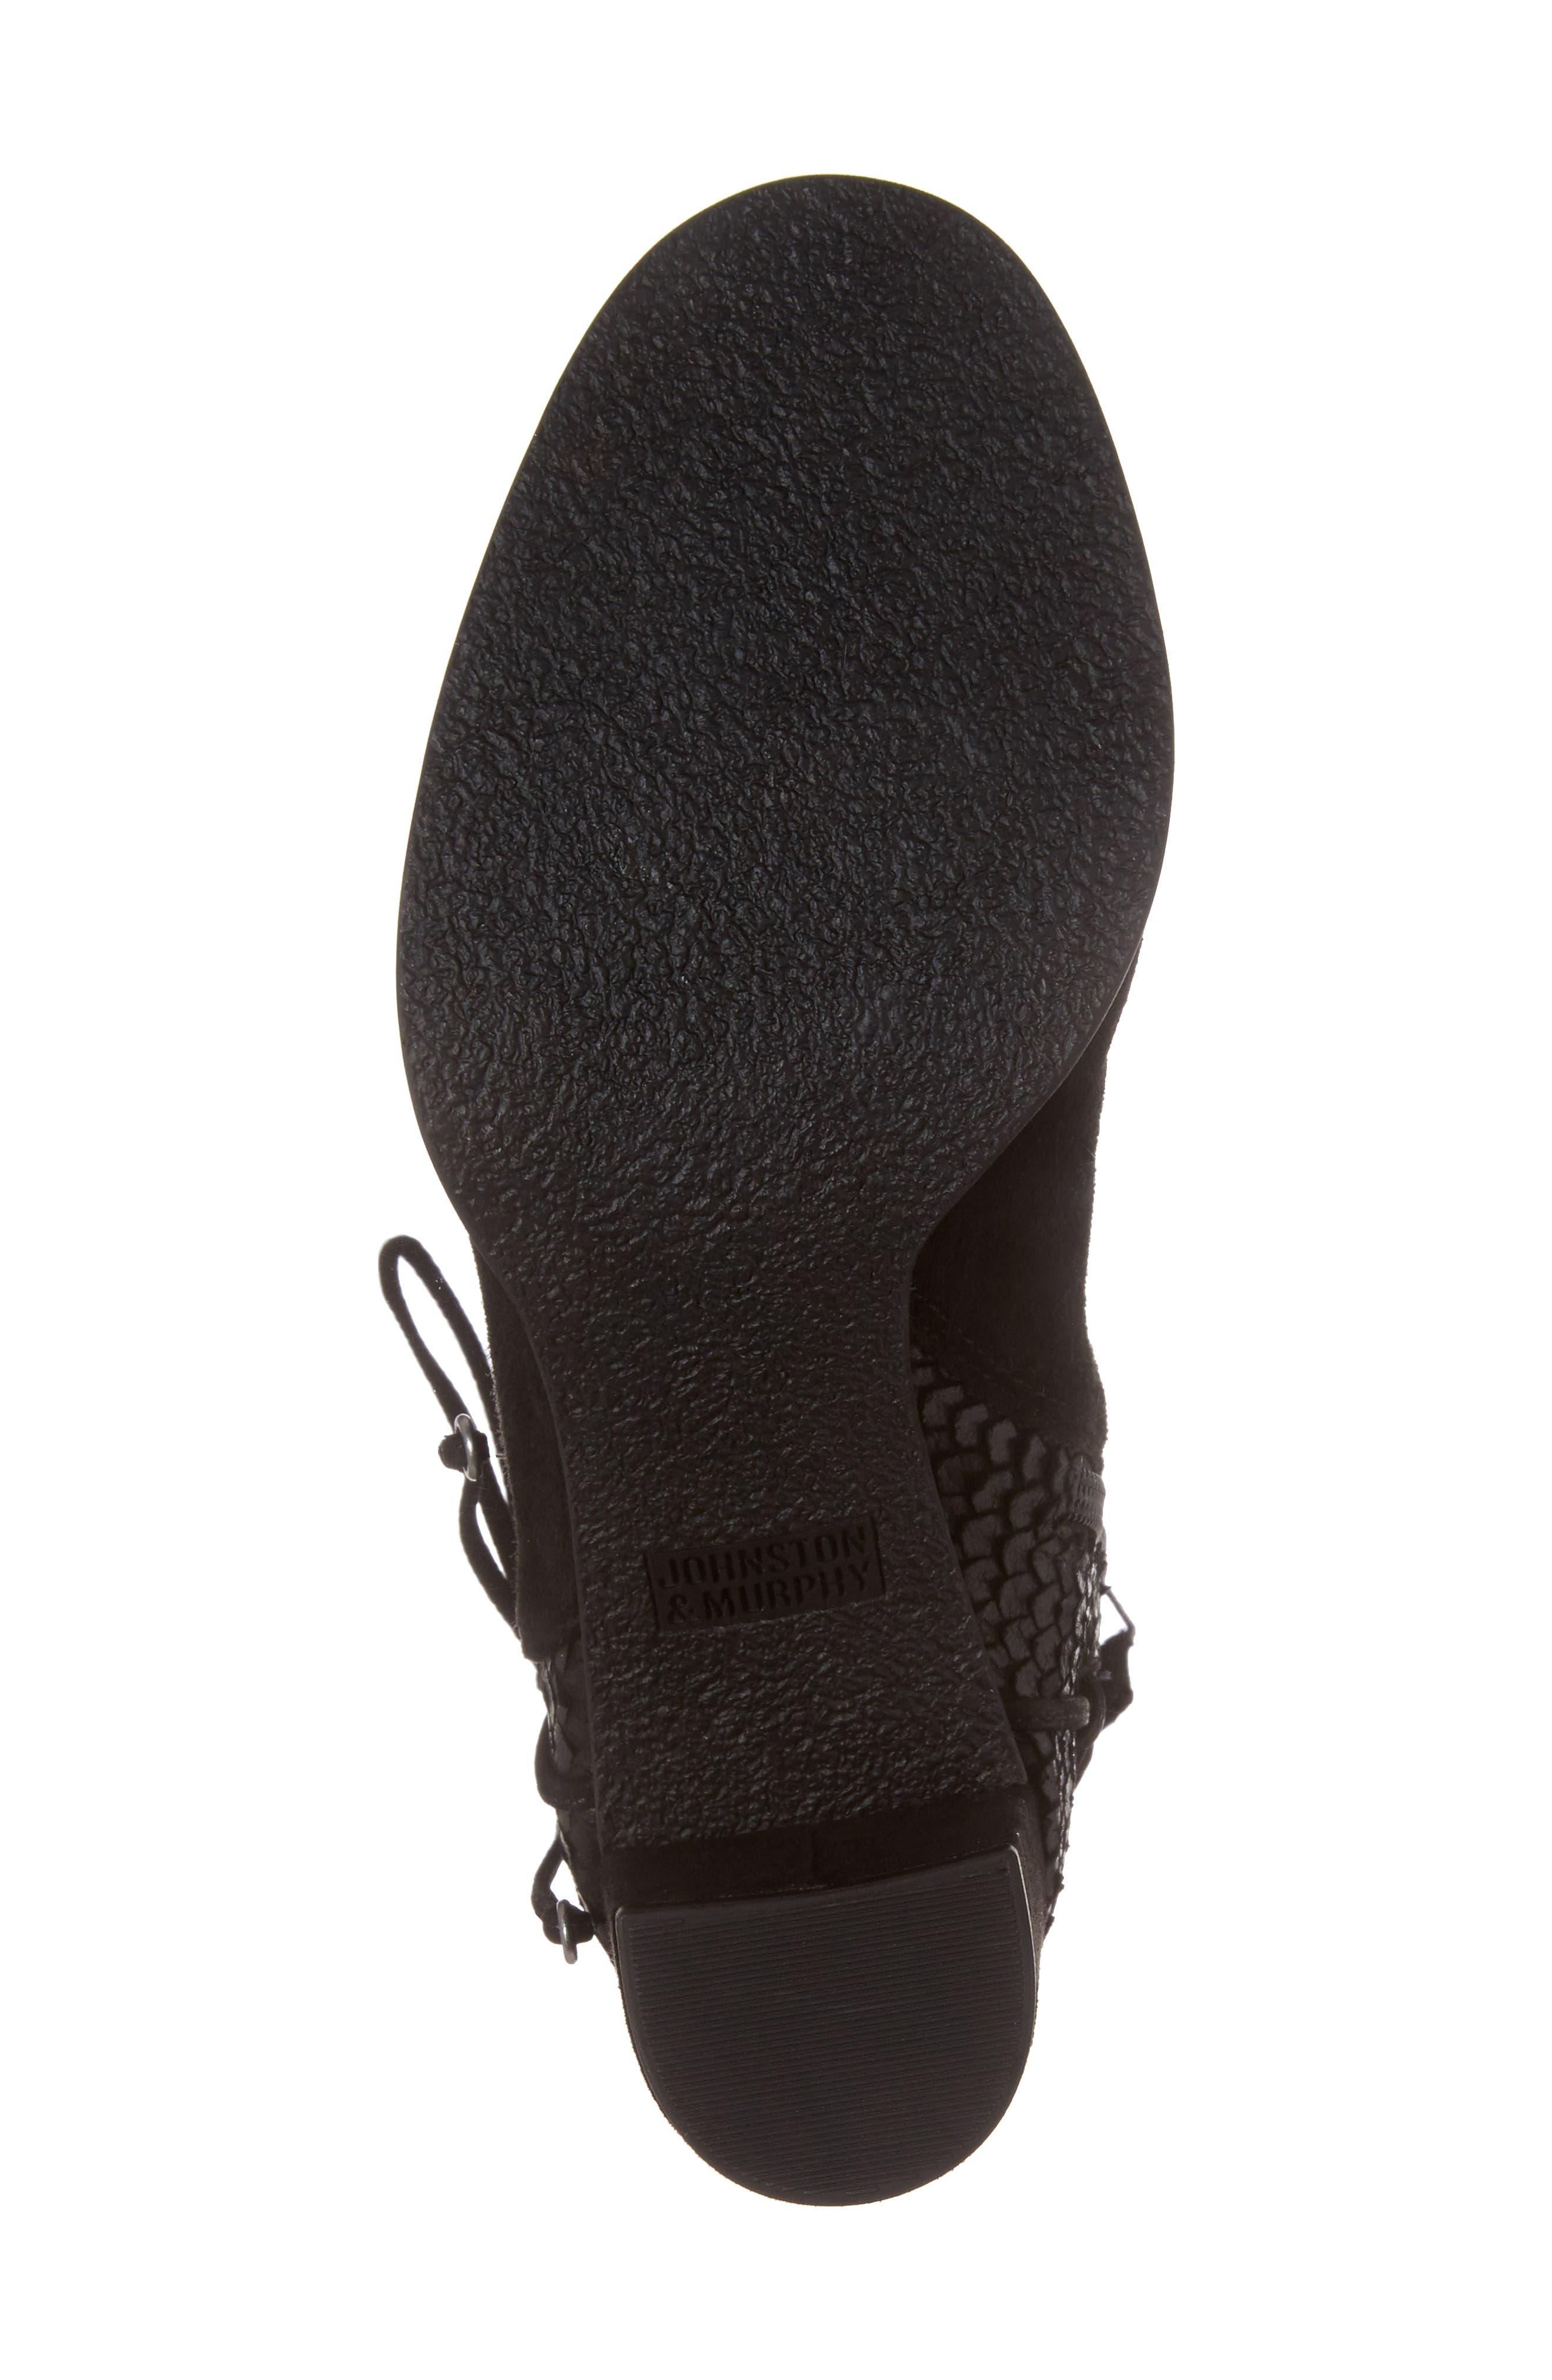 Adley Ankle Wrap Boot,                             Alternate thumbnail 6, color,                             001